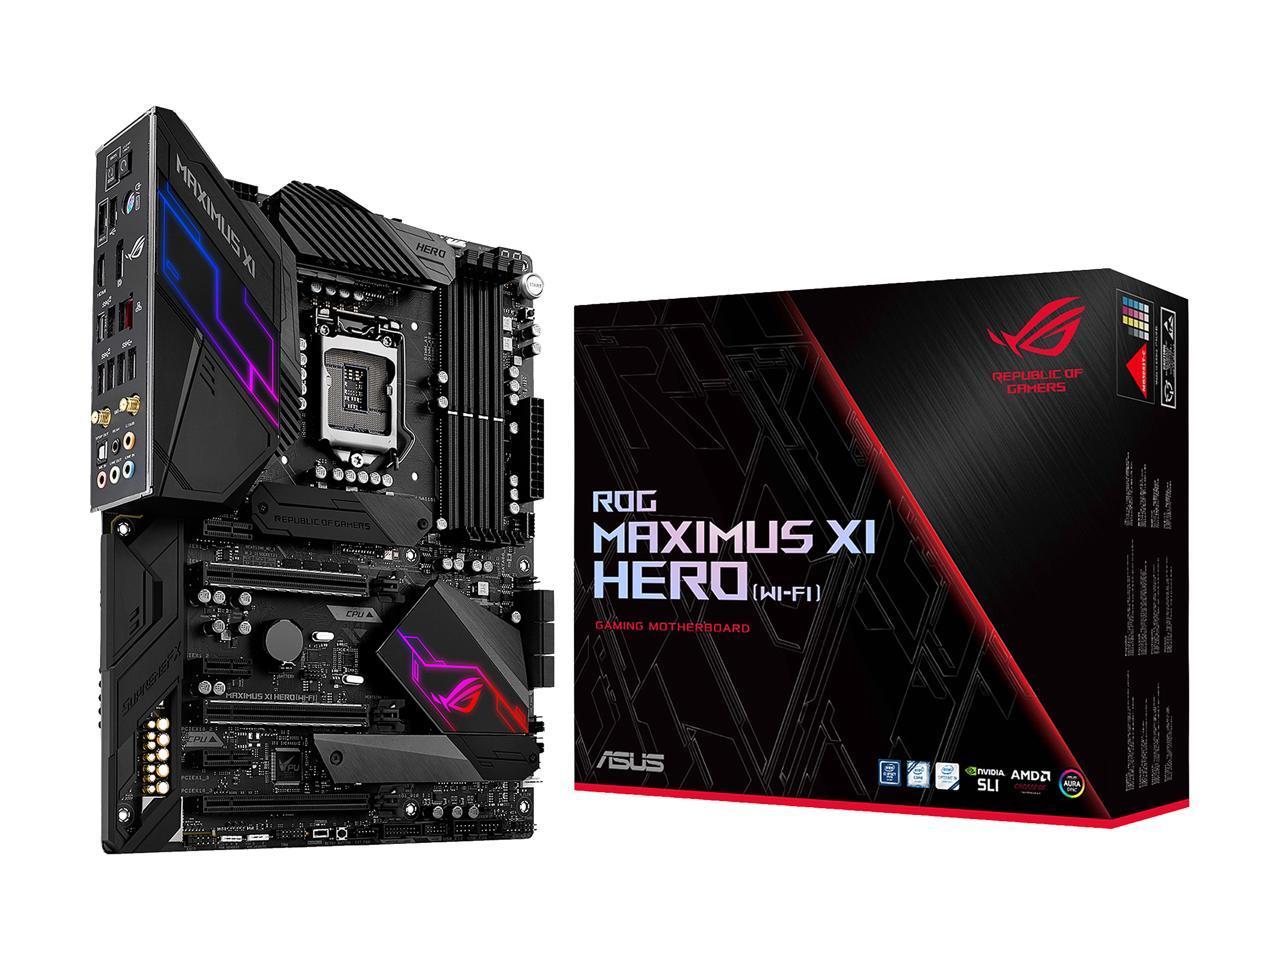 Best ASUS motherboard Maximus xi hero